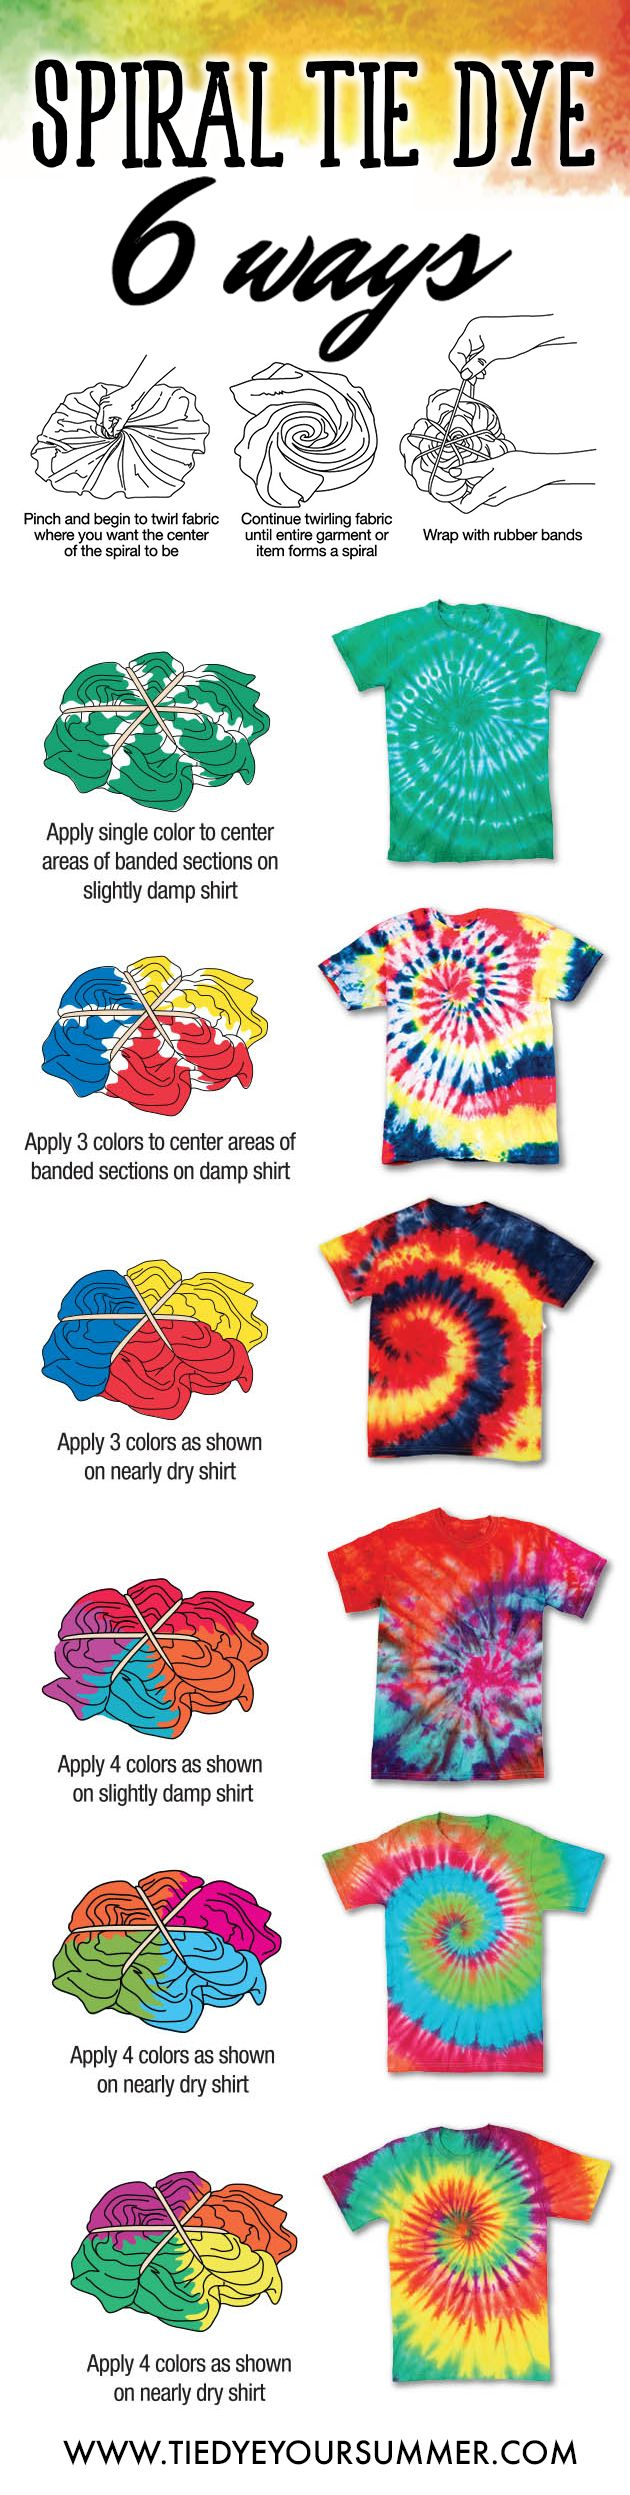 tie dye instructions photo - 1